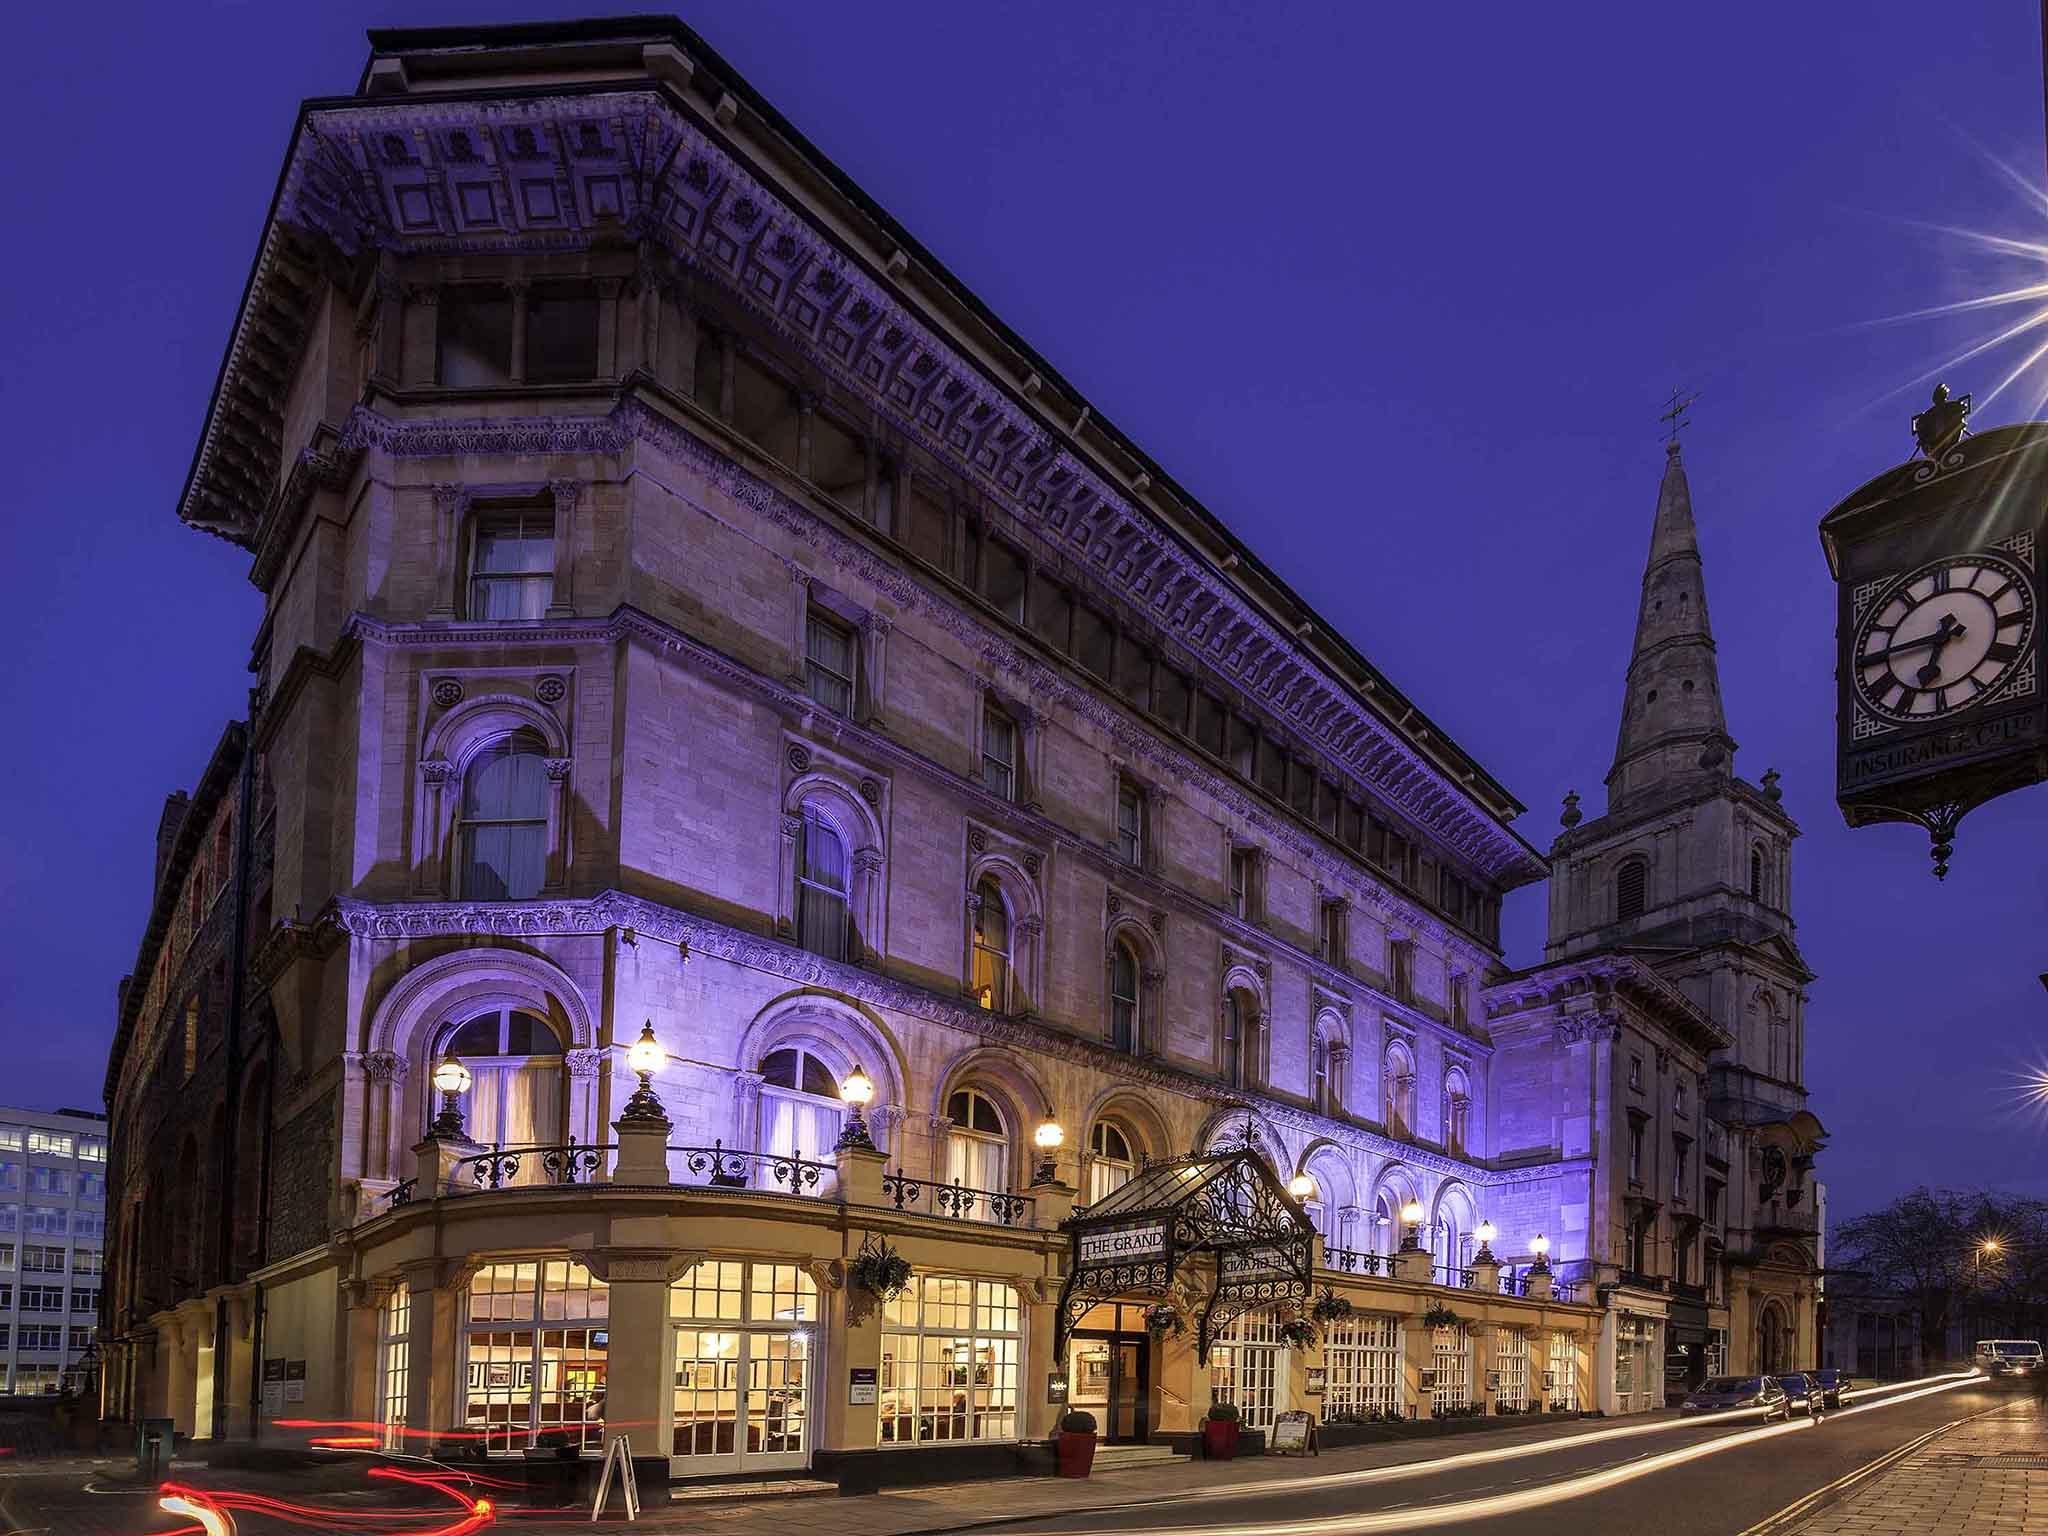 Hotel - Mercure Bristol Grand Hotel (neu renoviert)